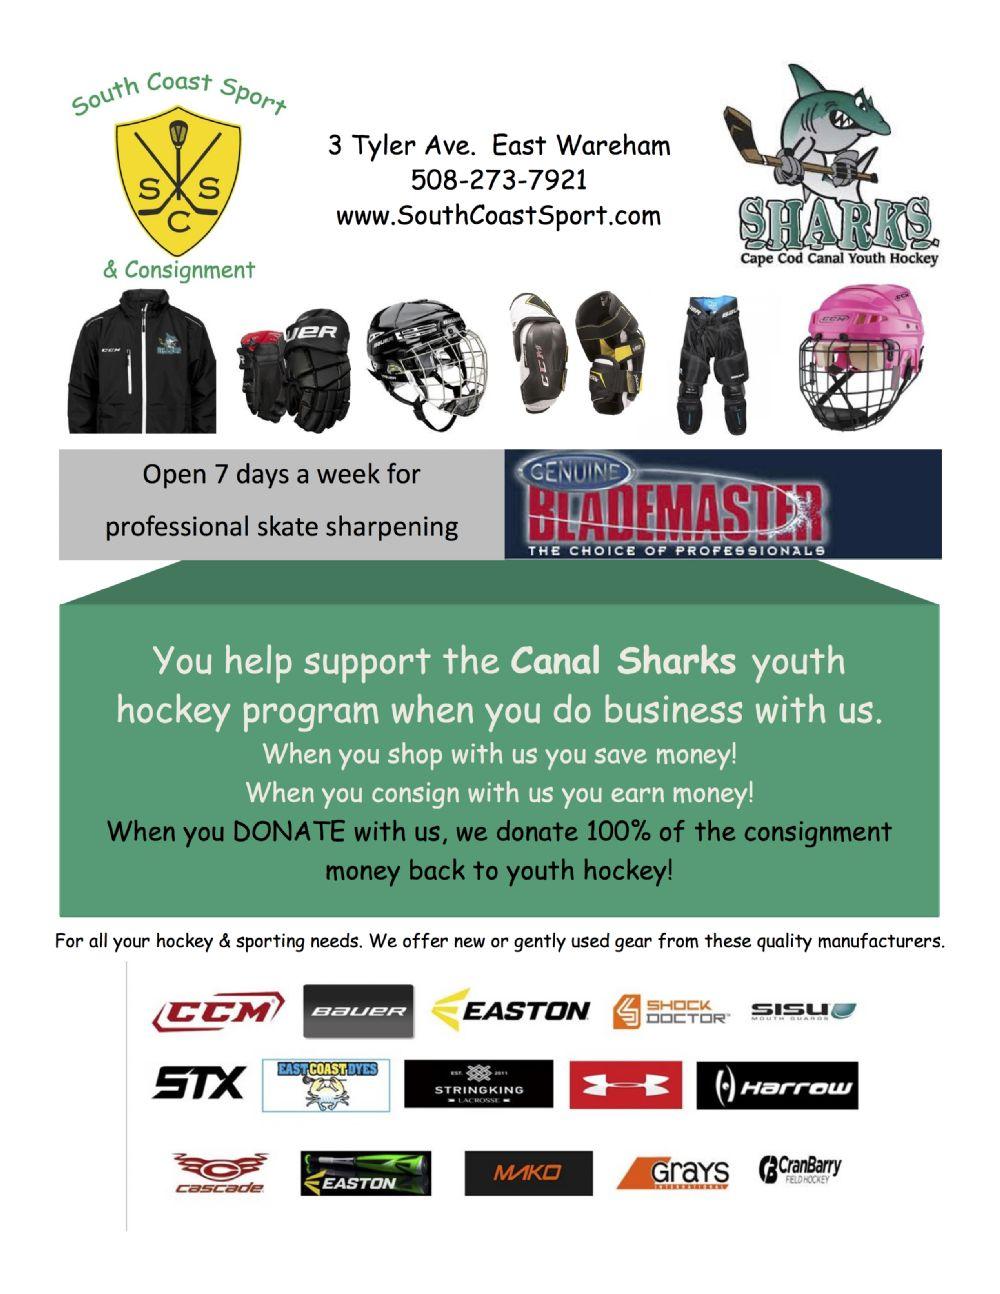 Cape Cod Canal Youth Hockey